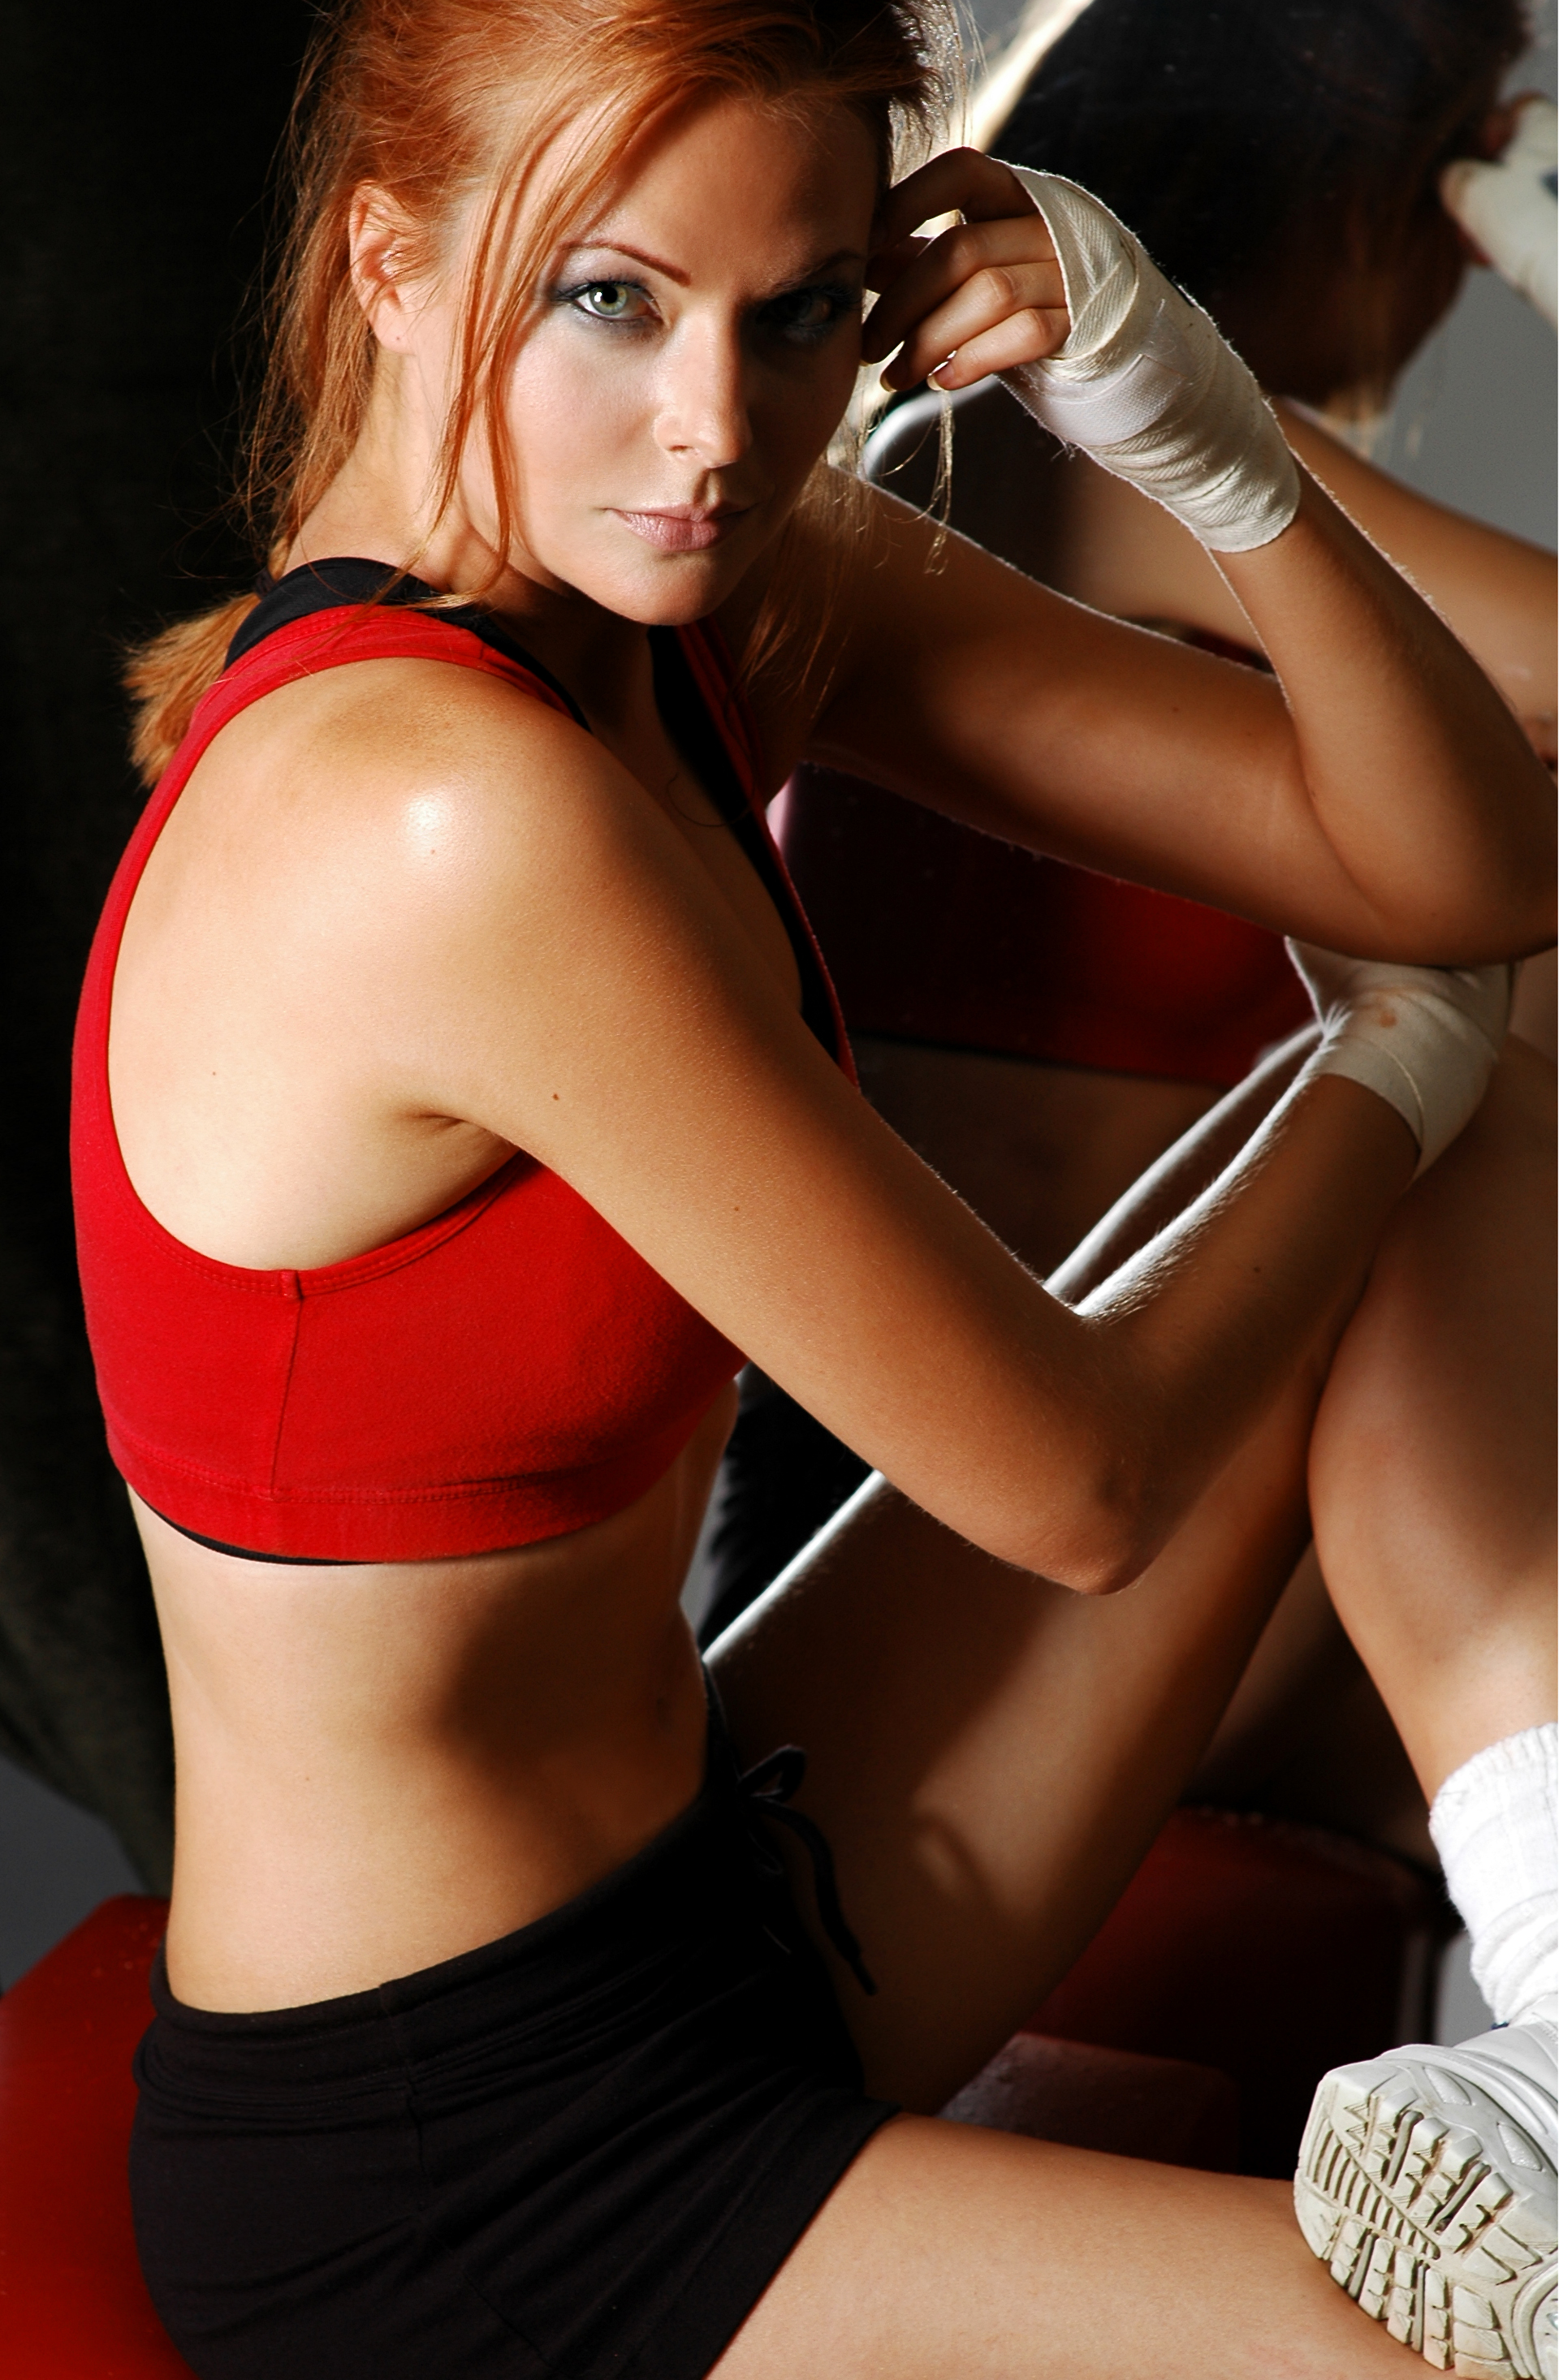 boxing02-2-2